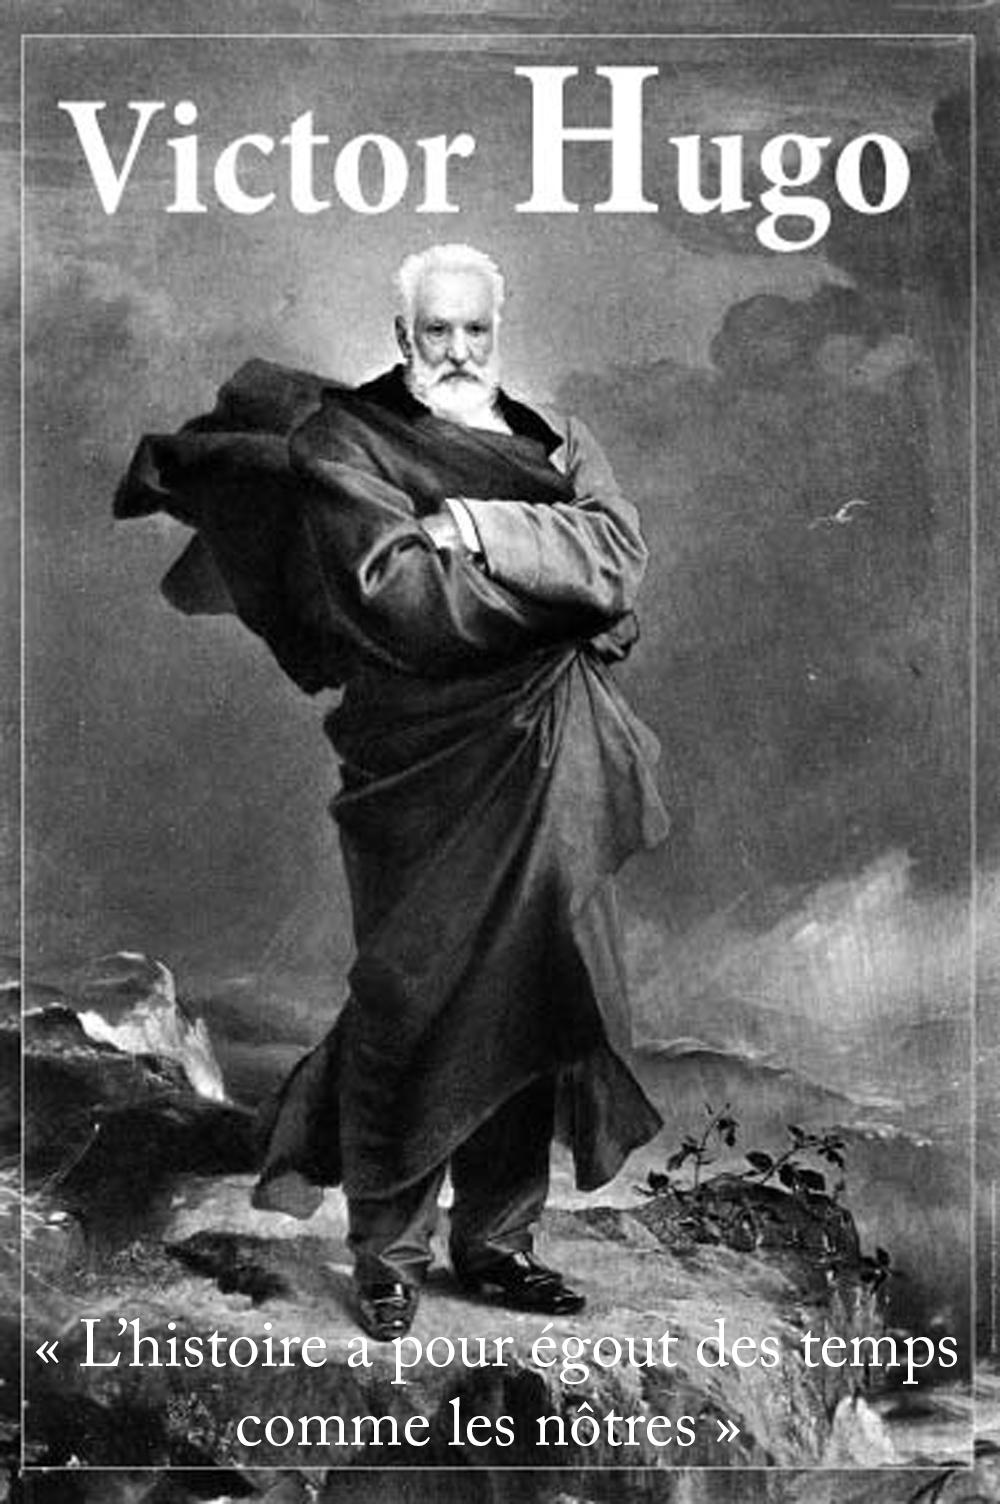 Exposition Victor Hugo - une exposition sur Victor-Hugo